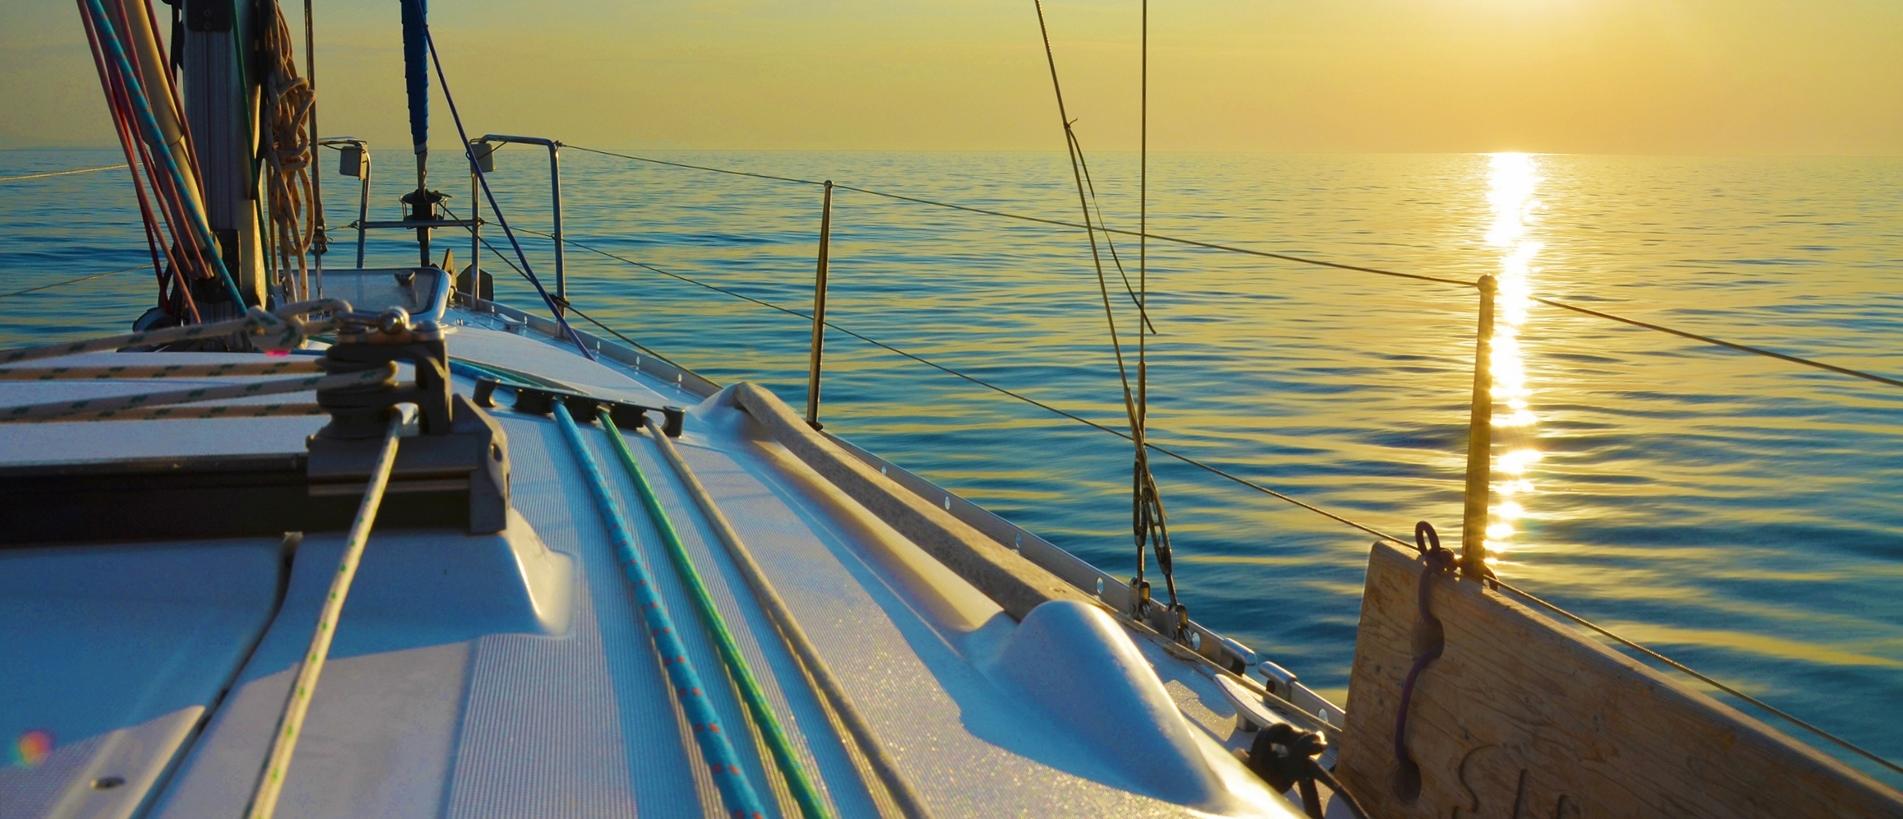 Andaman Yachting. Phuket's Premier RYA Training Centre ...